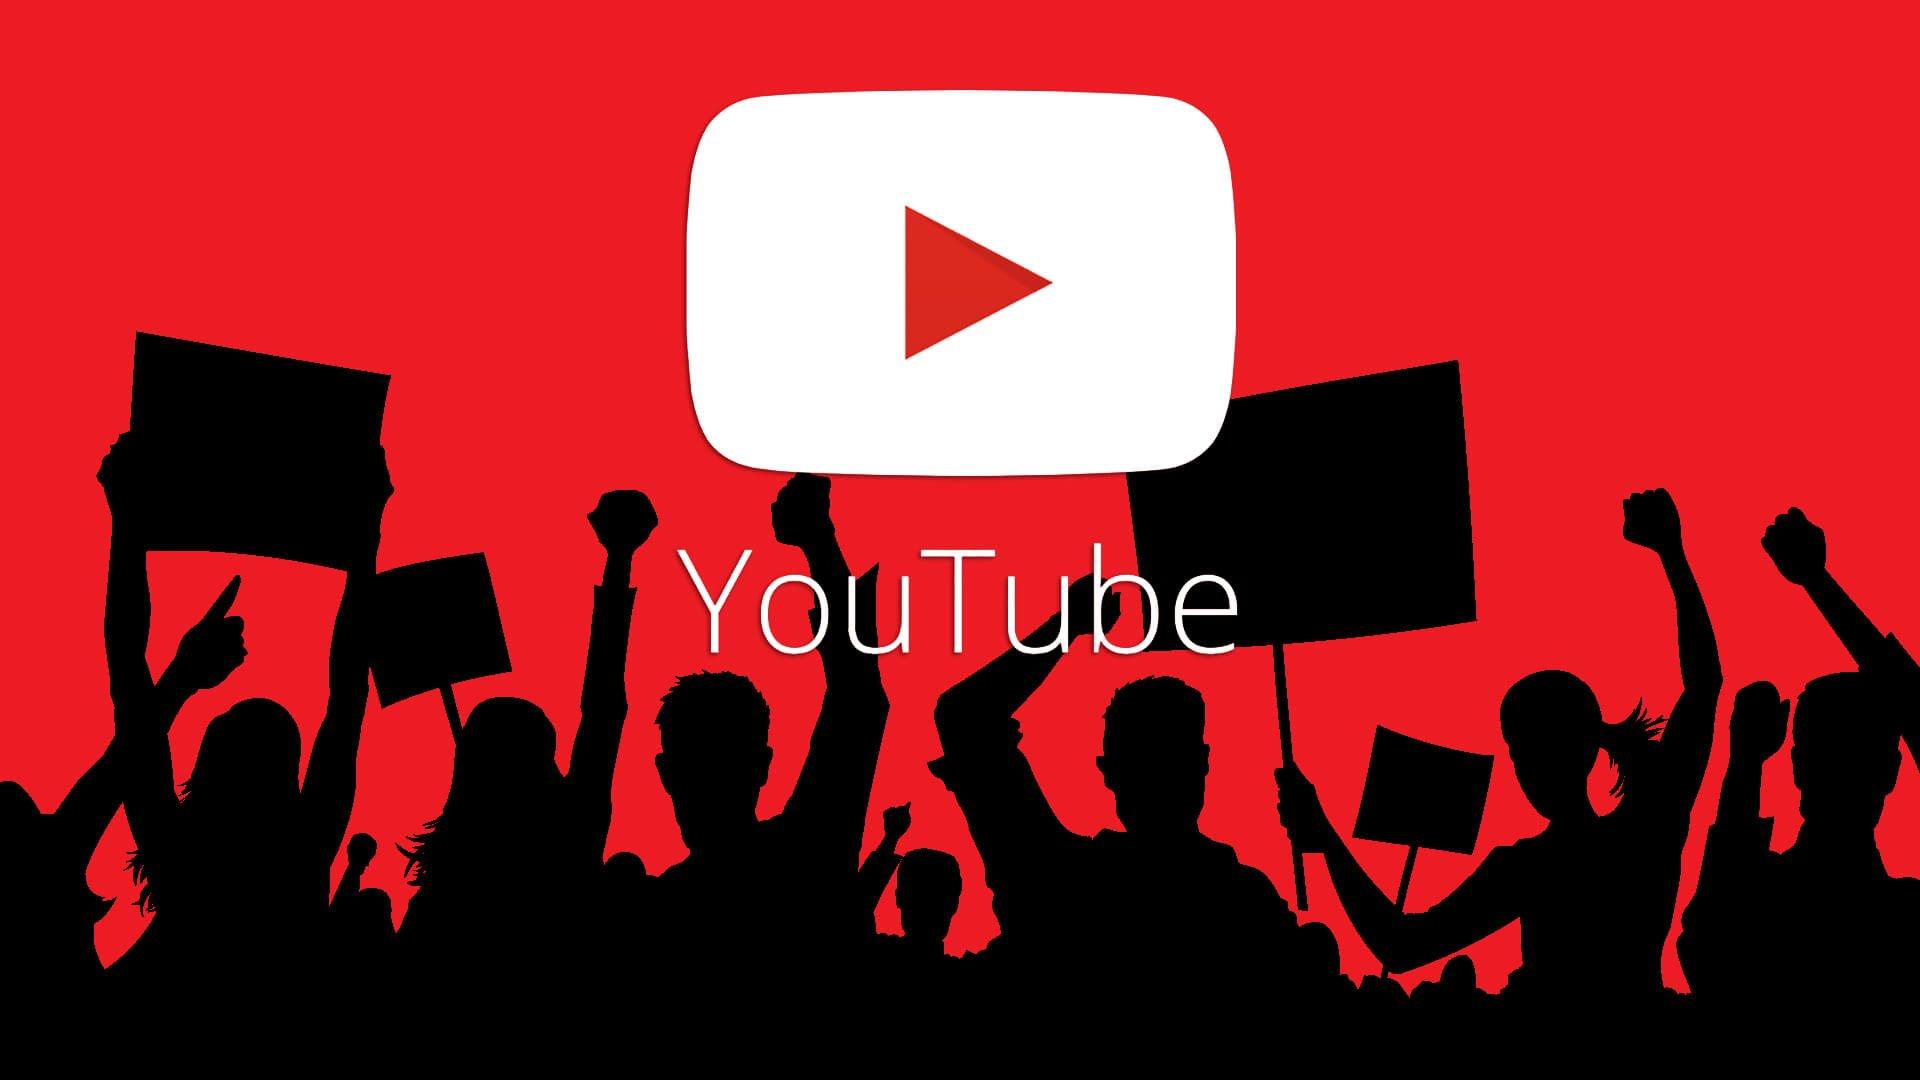 Luchshie YouTube kanaly bukmekerskih kontor